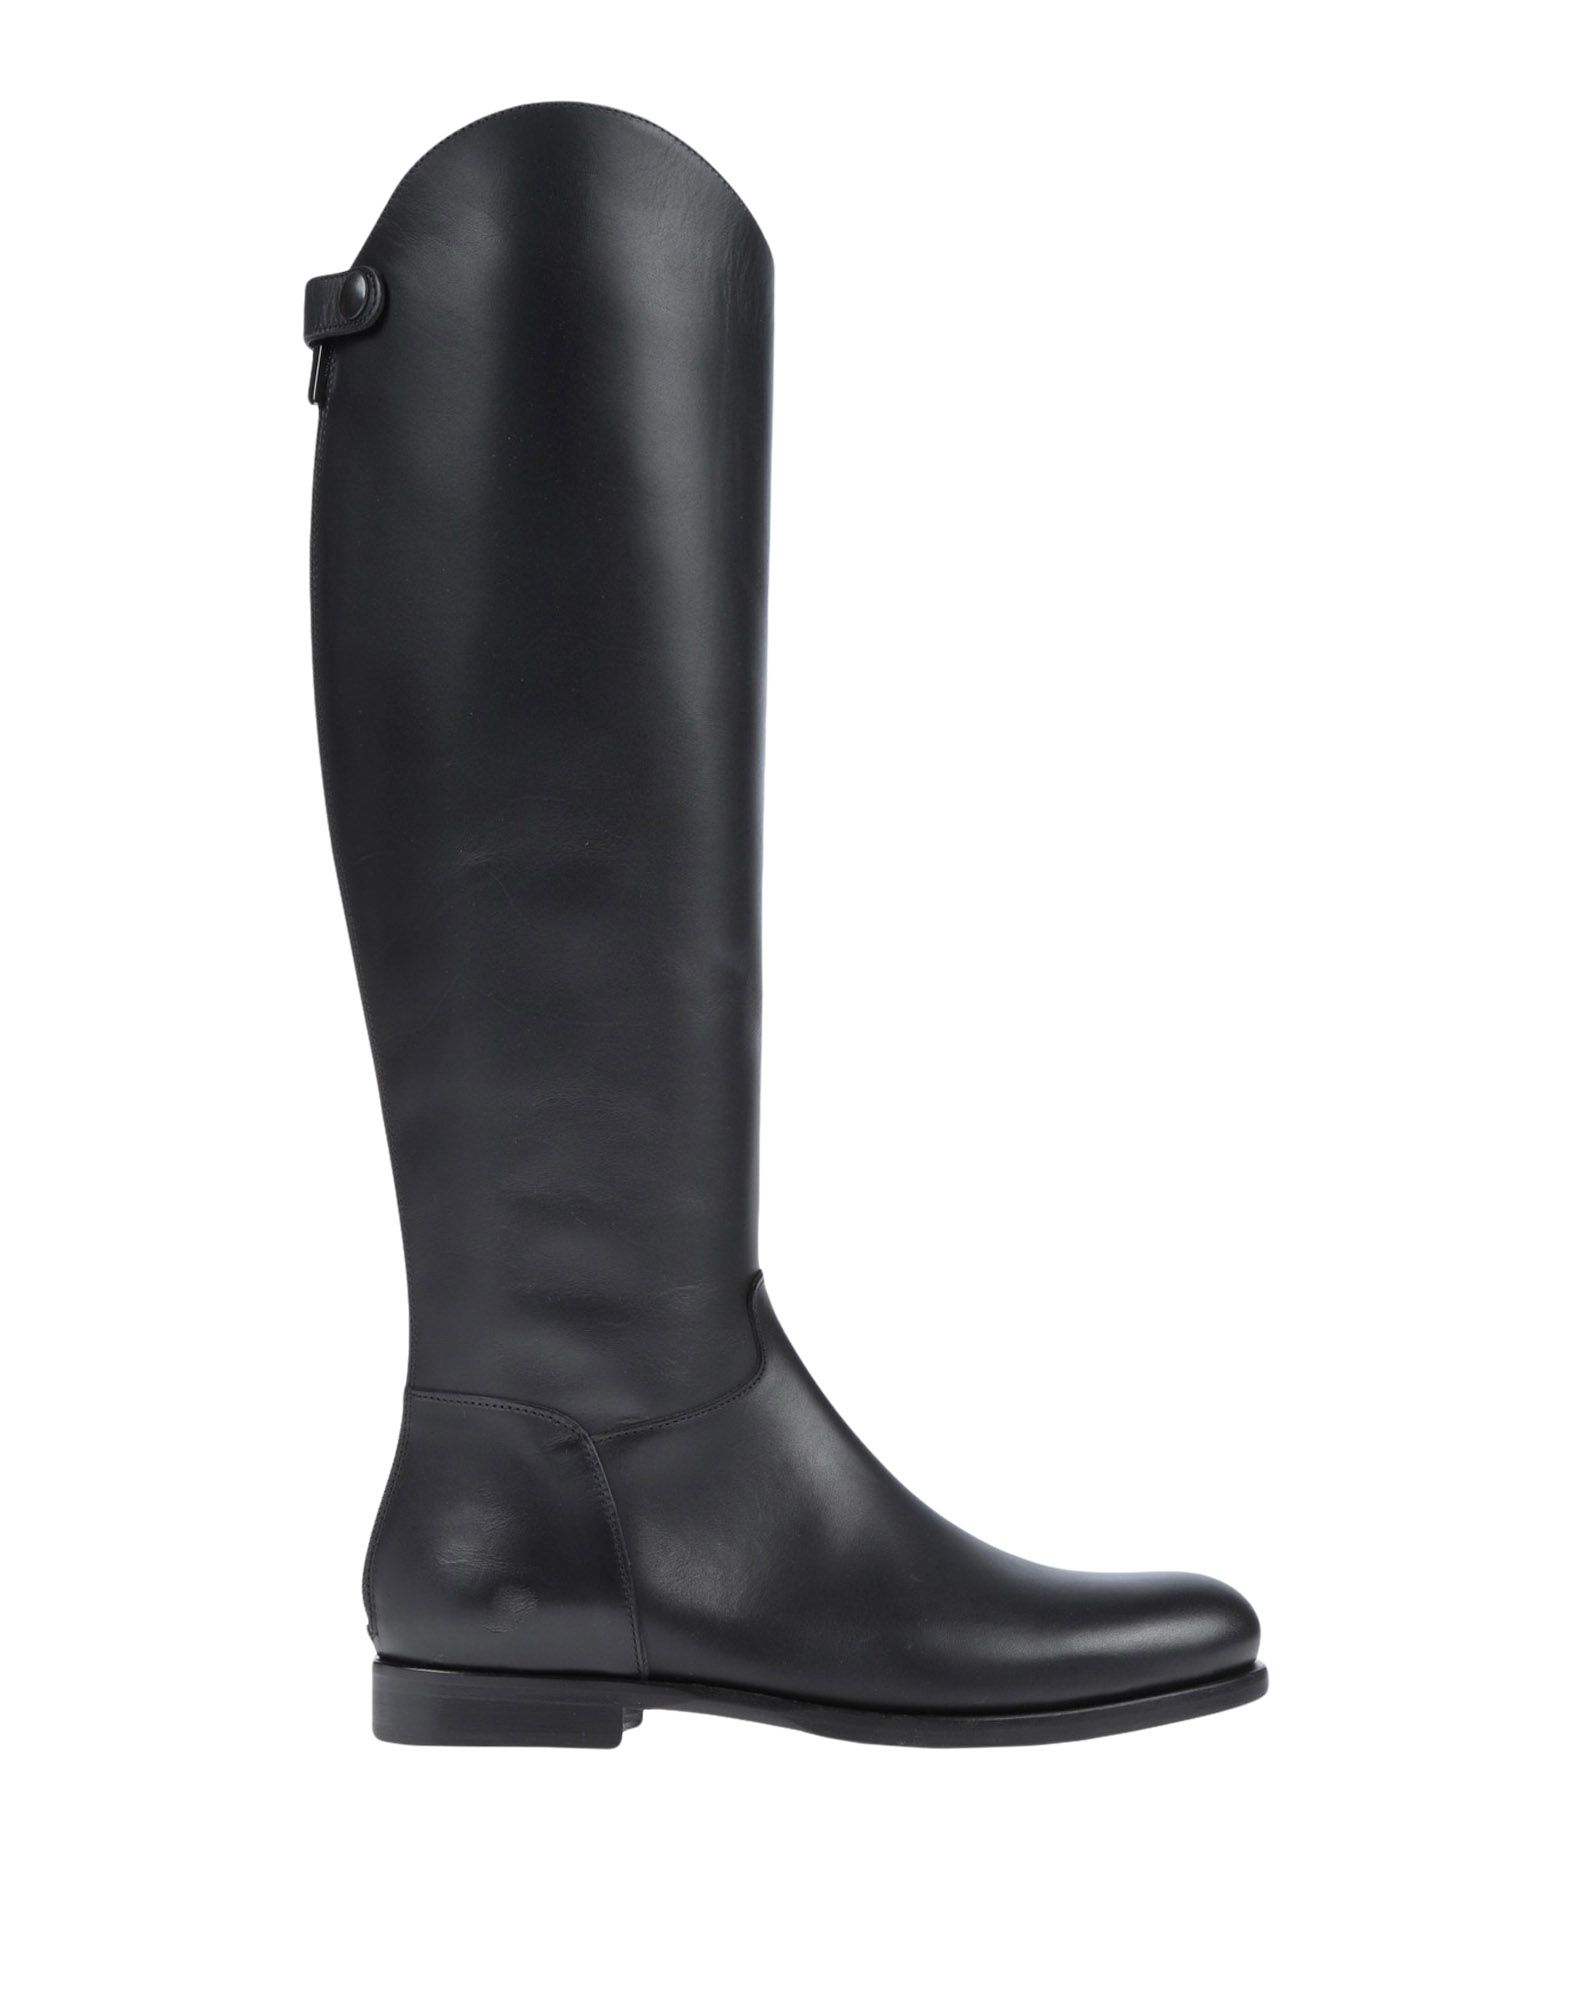 Rabatt Schuhe Liviana Conti Stiefel Damen  11533010BU